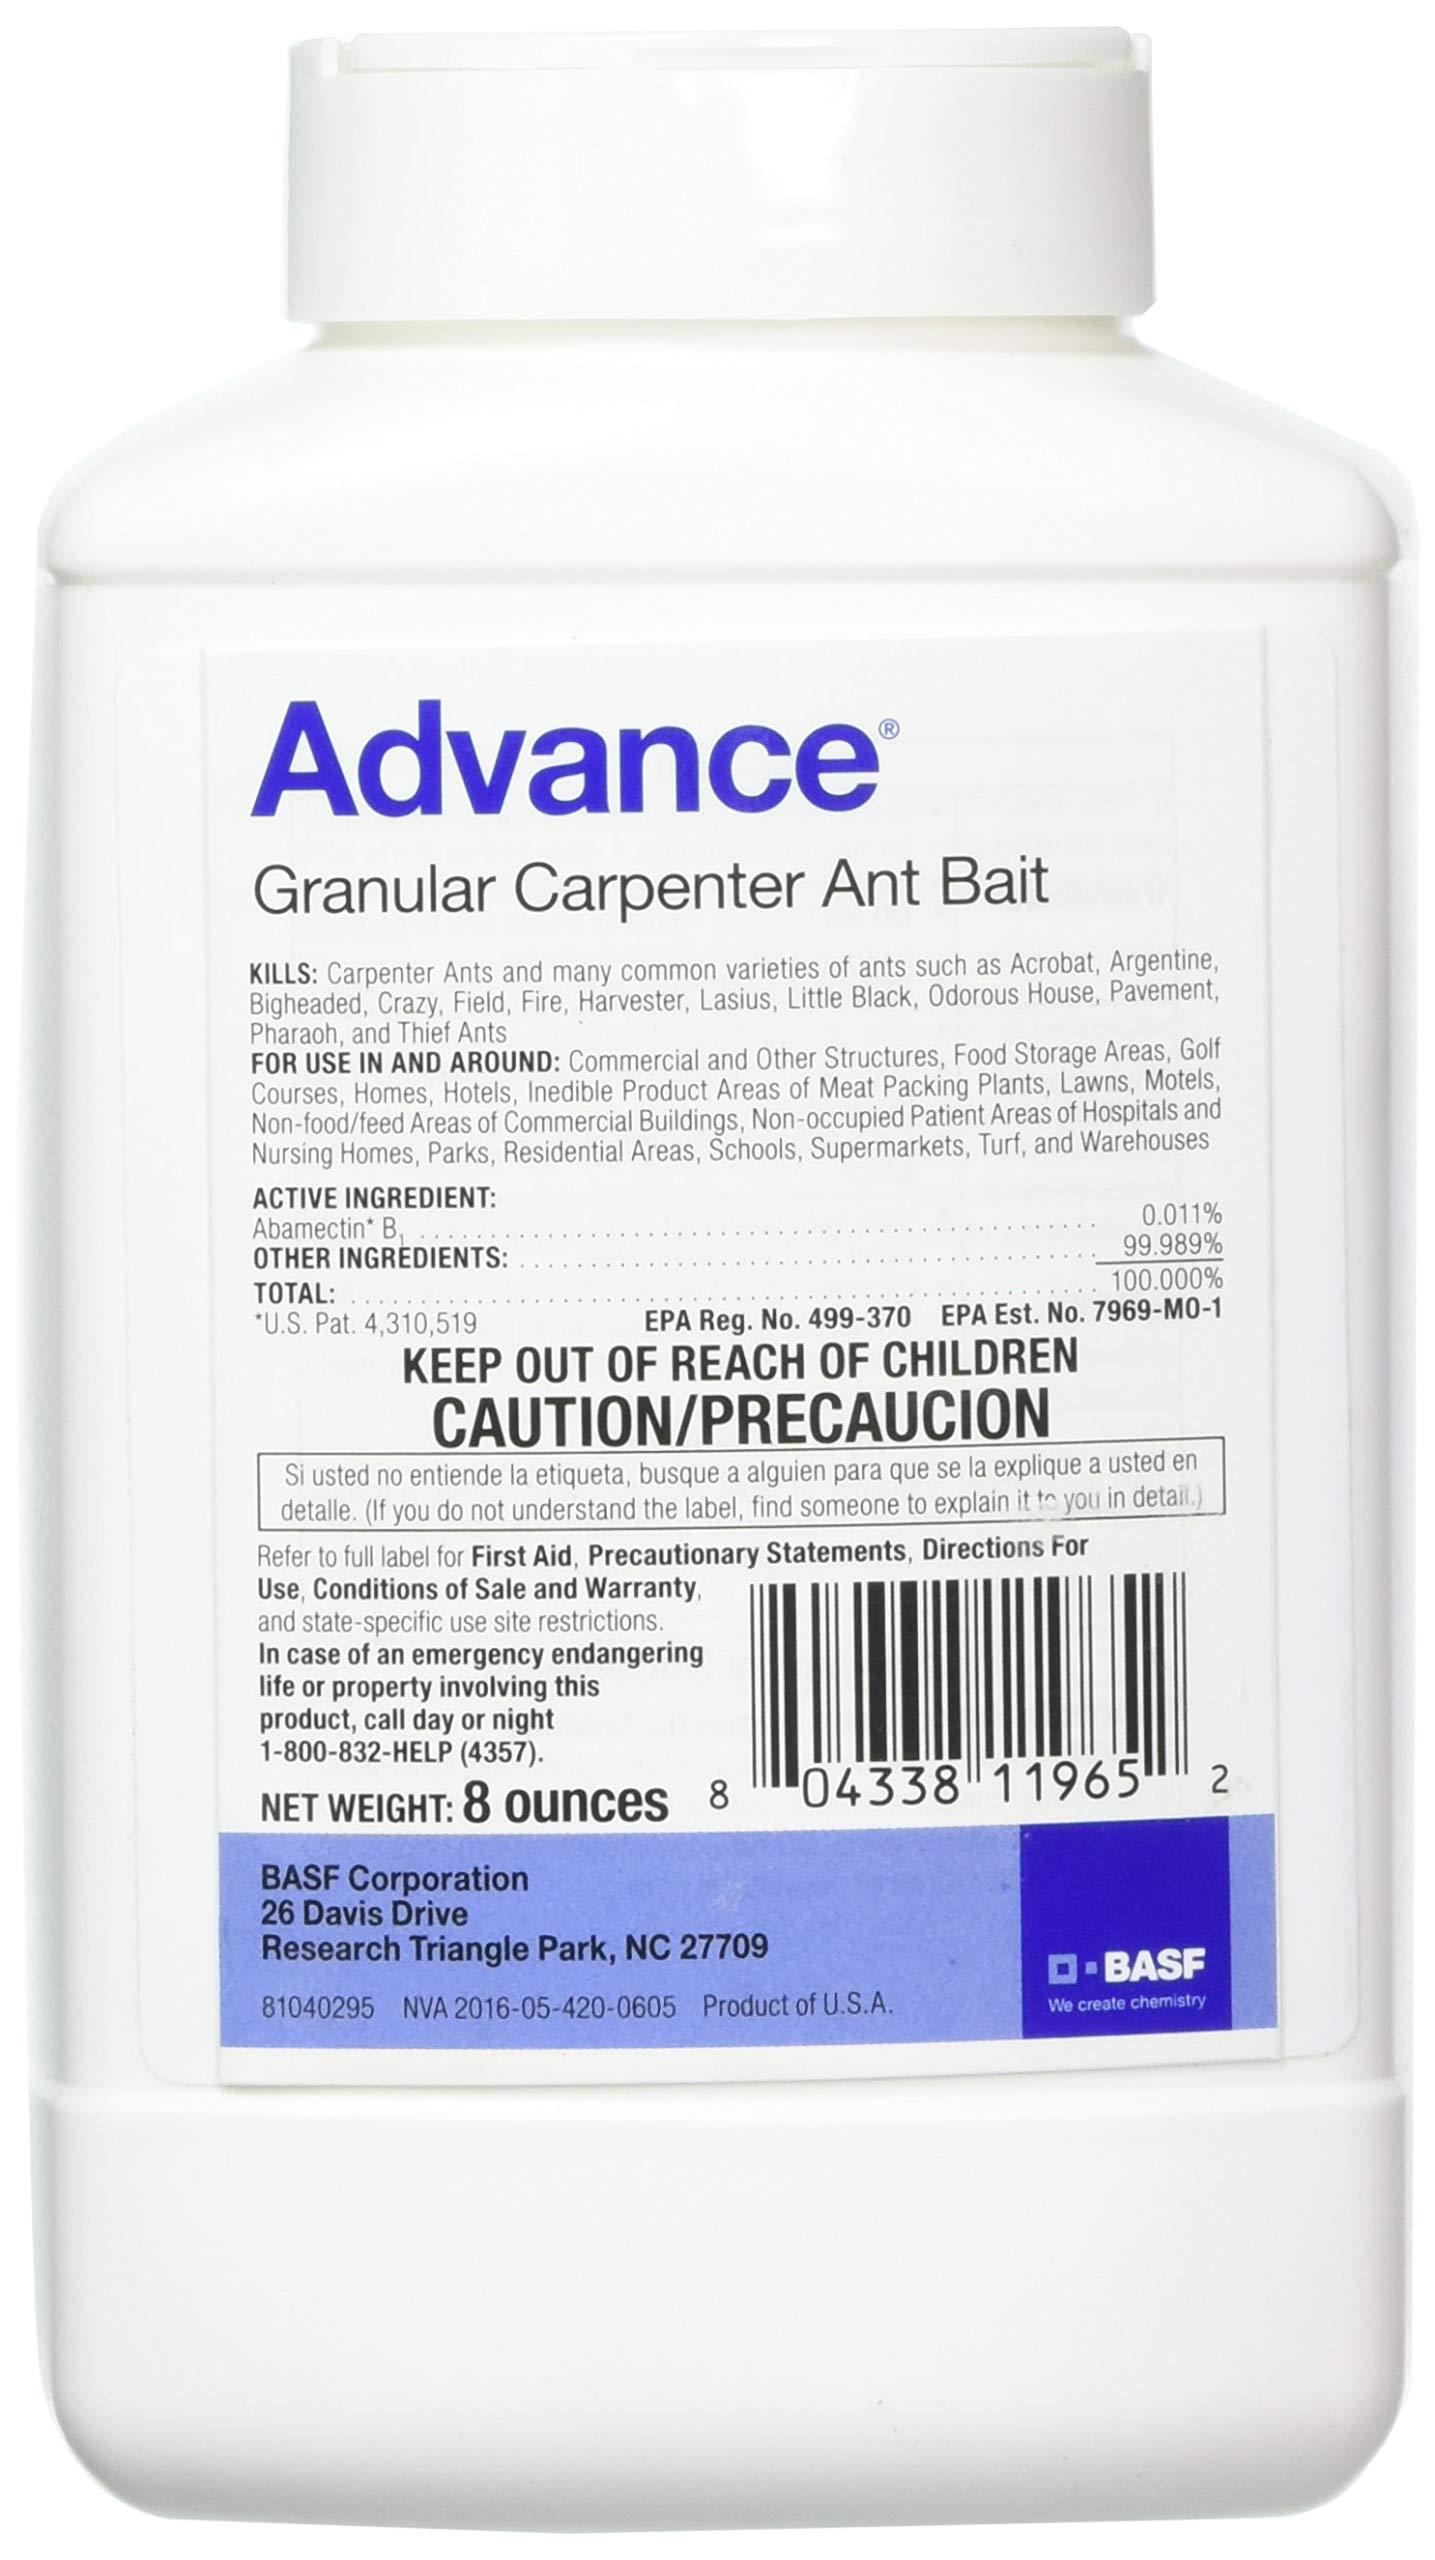 BASF 396153 Advance Granular Carpenter Ant Bait, 8oz by BASF